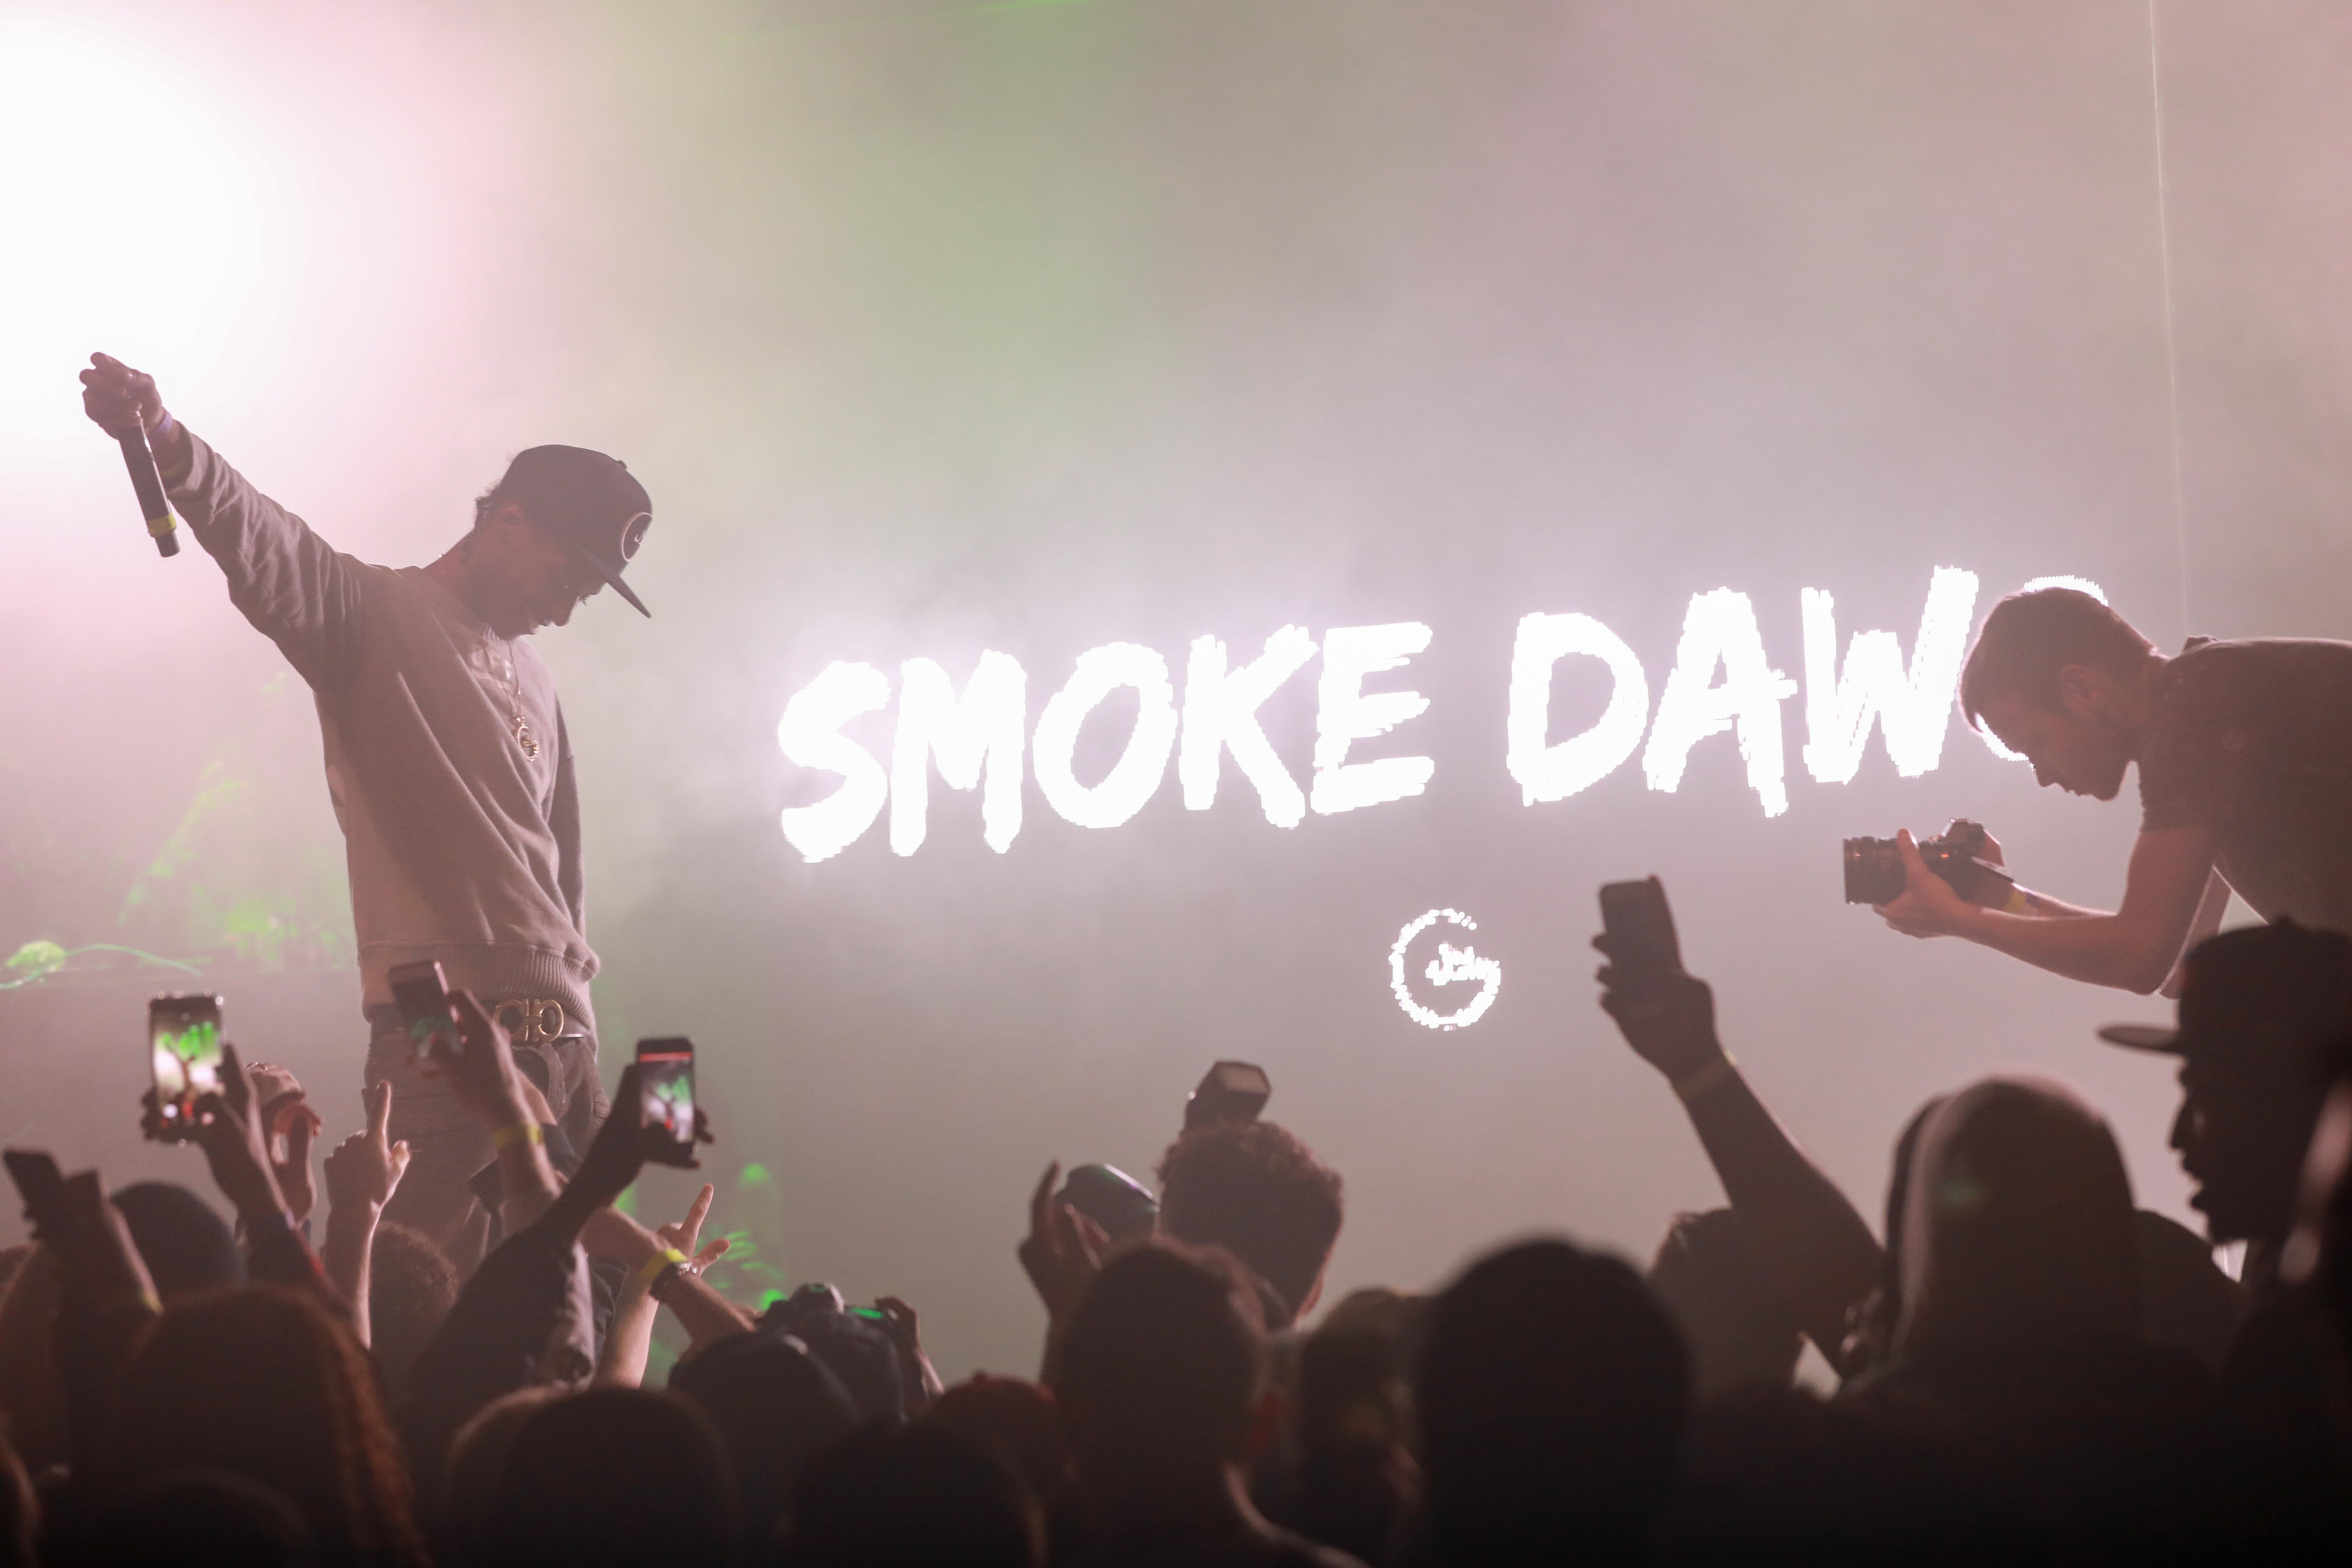 Toronto rapper, Smoke Dawg performs in Toronto. Luke Galati photography.